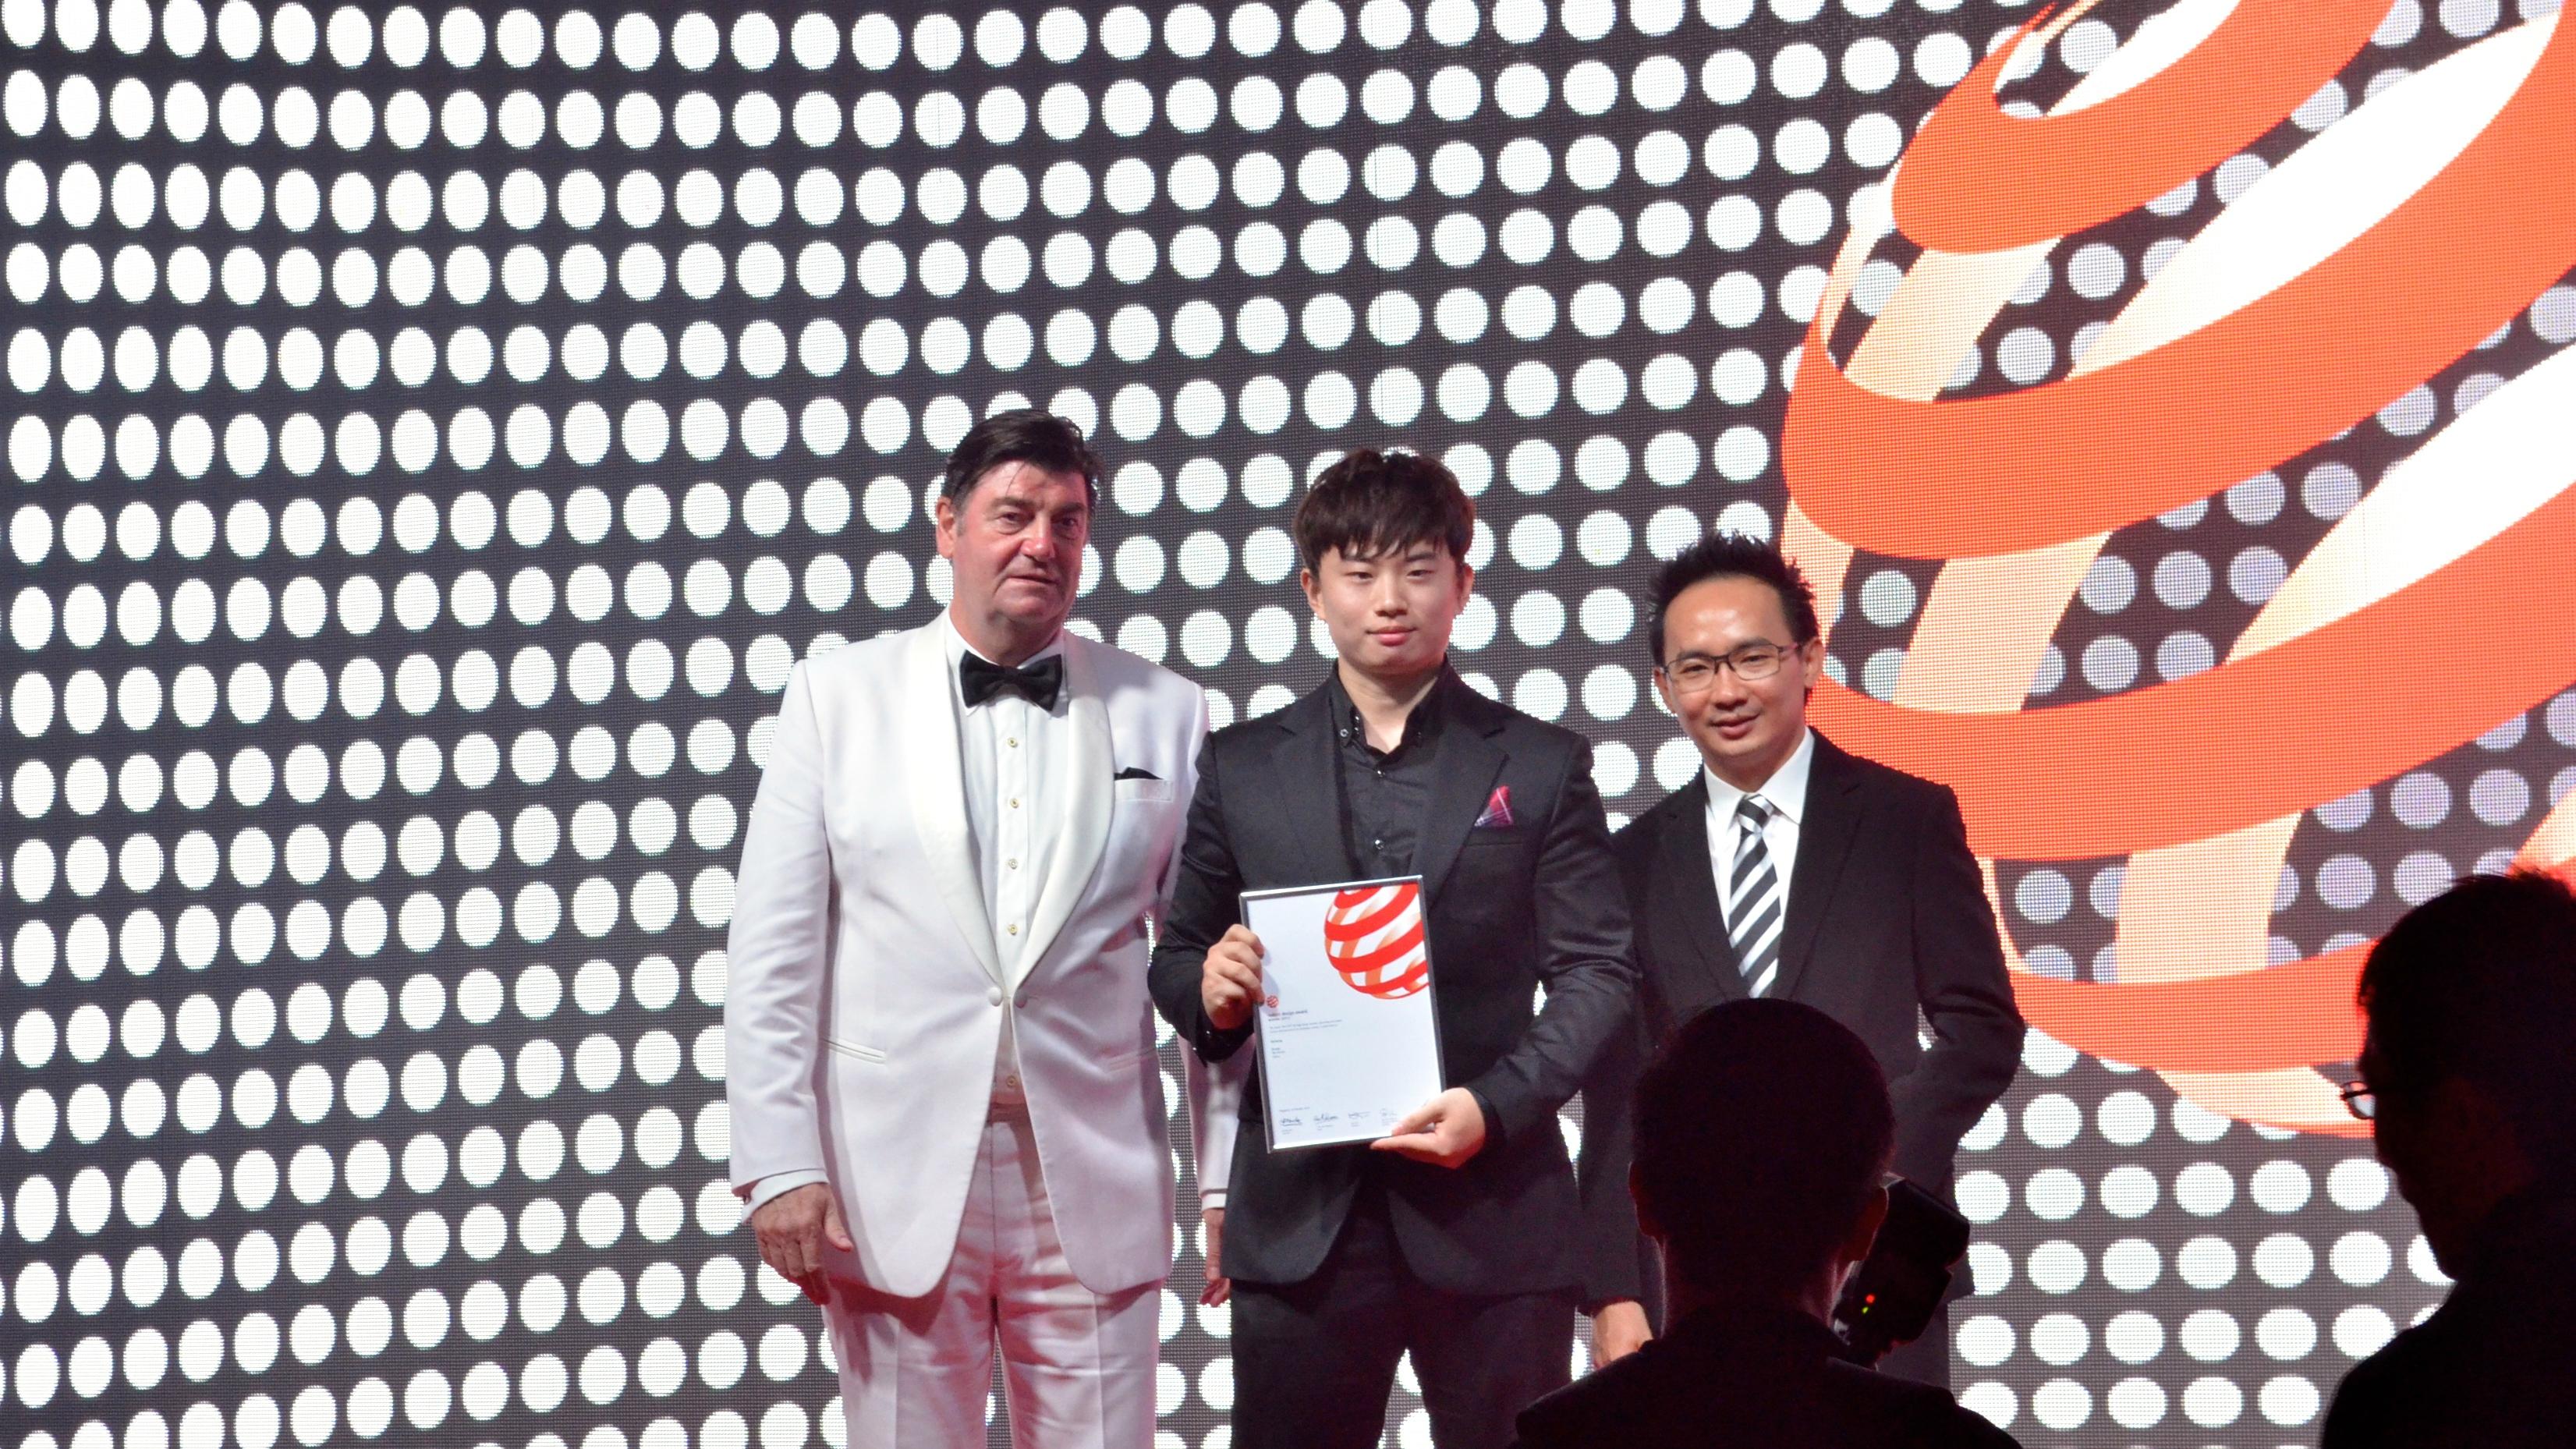 reddot award 2013